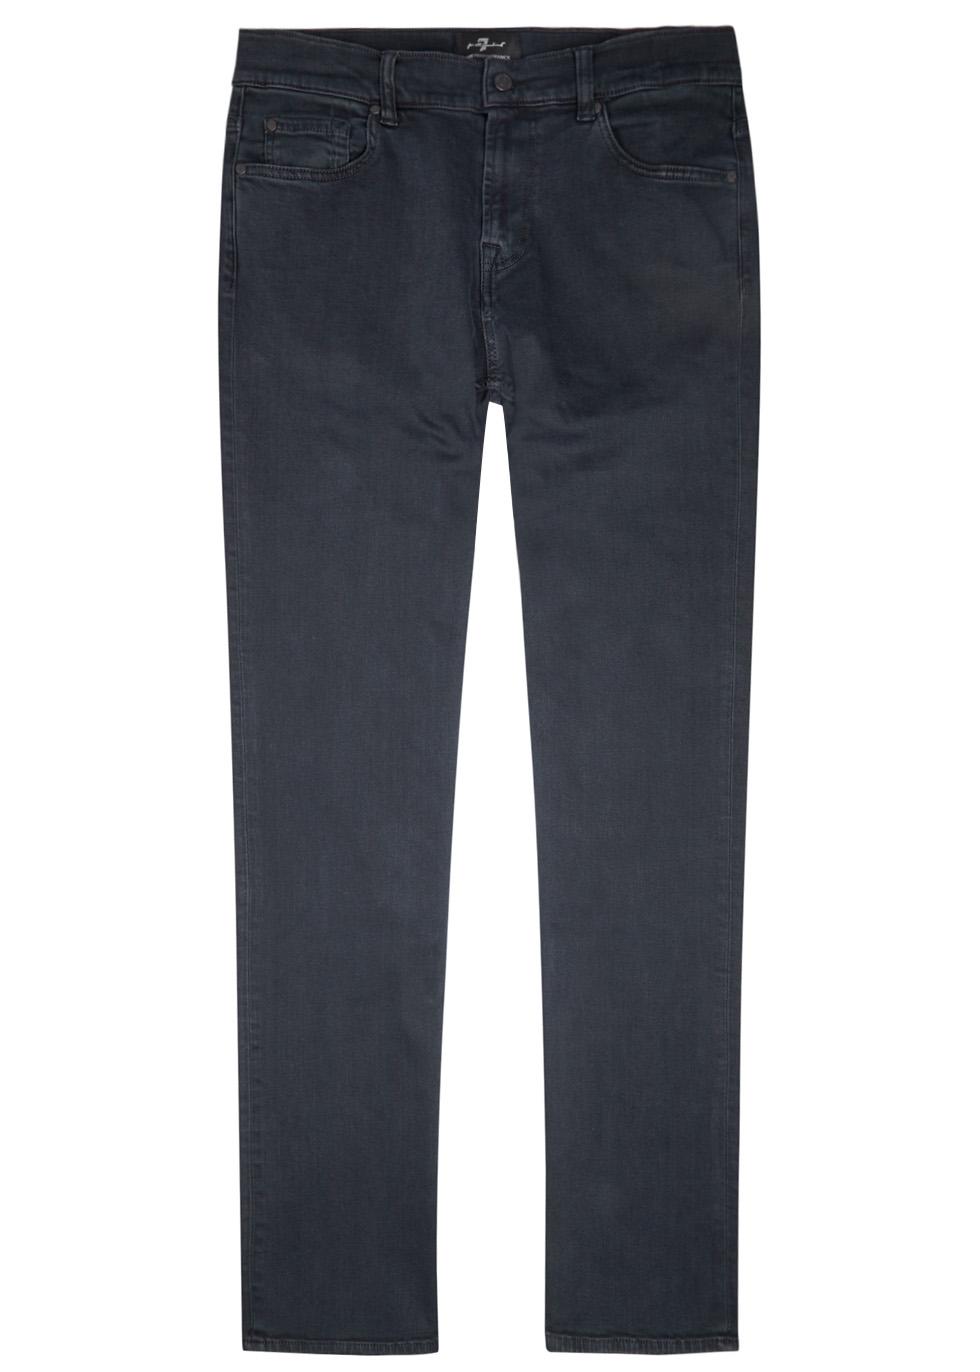 Standard Luxe Performance straight leg jeans